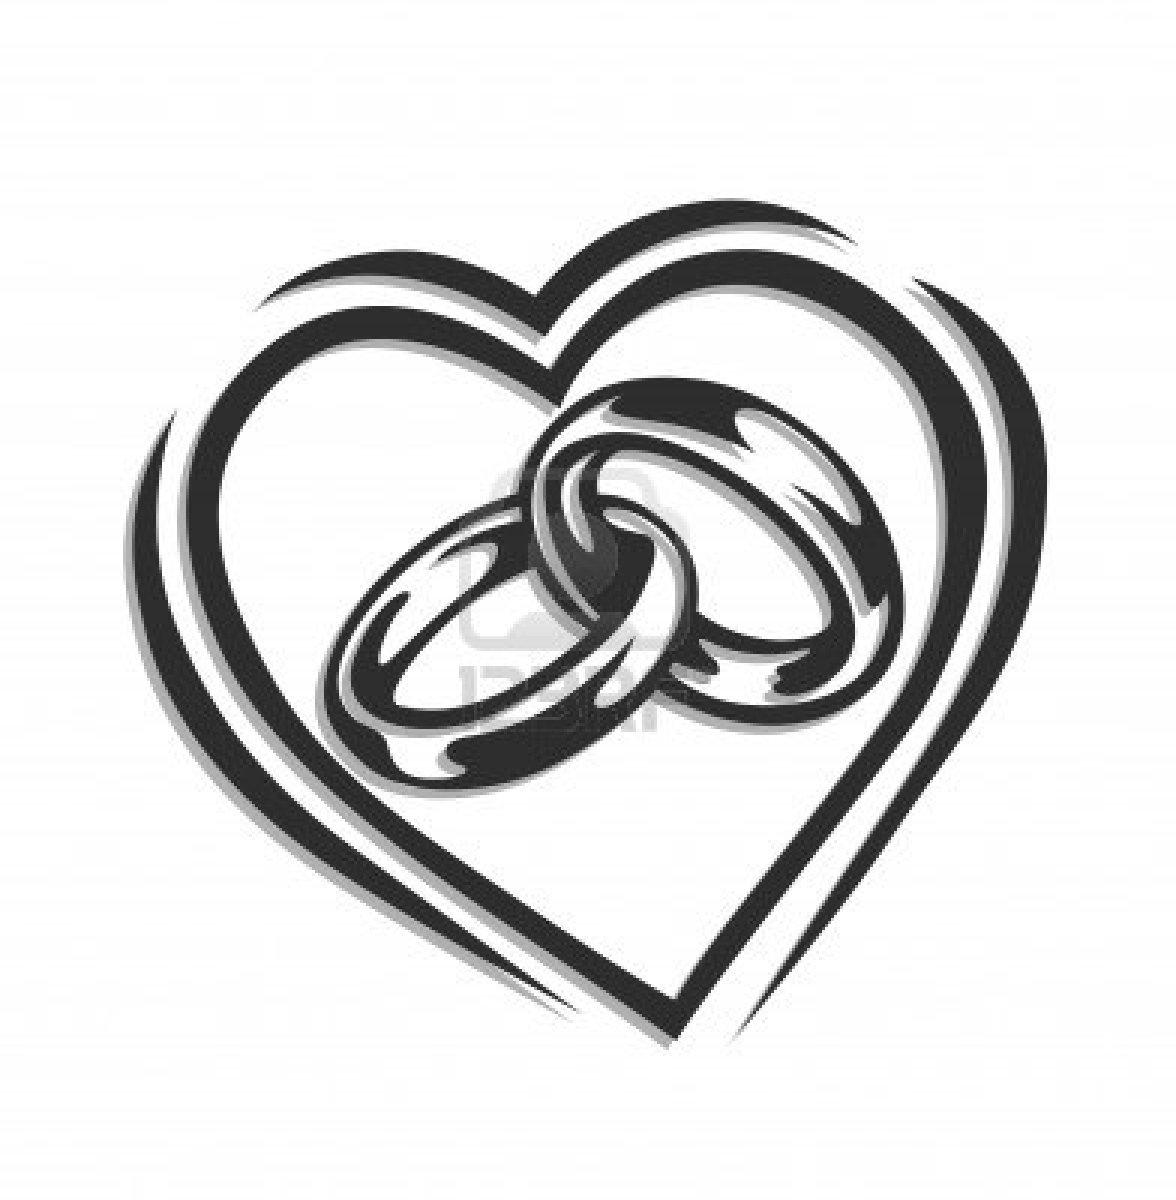 wedding heart clipart free gray #16